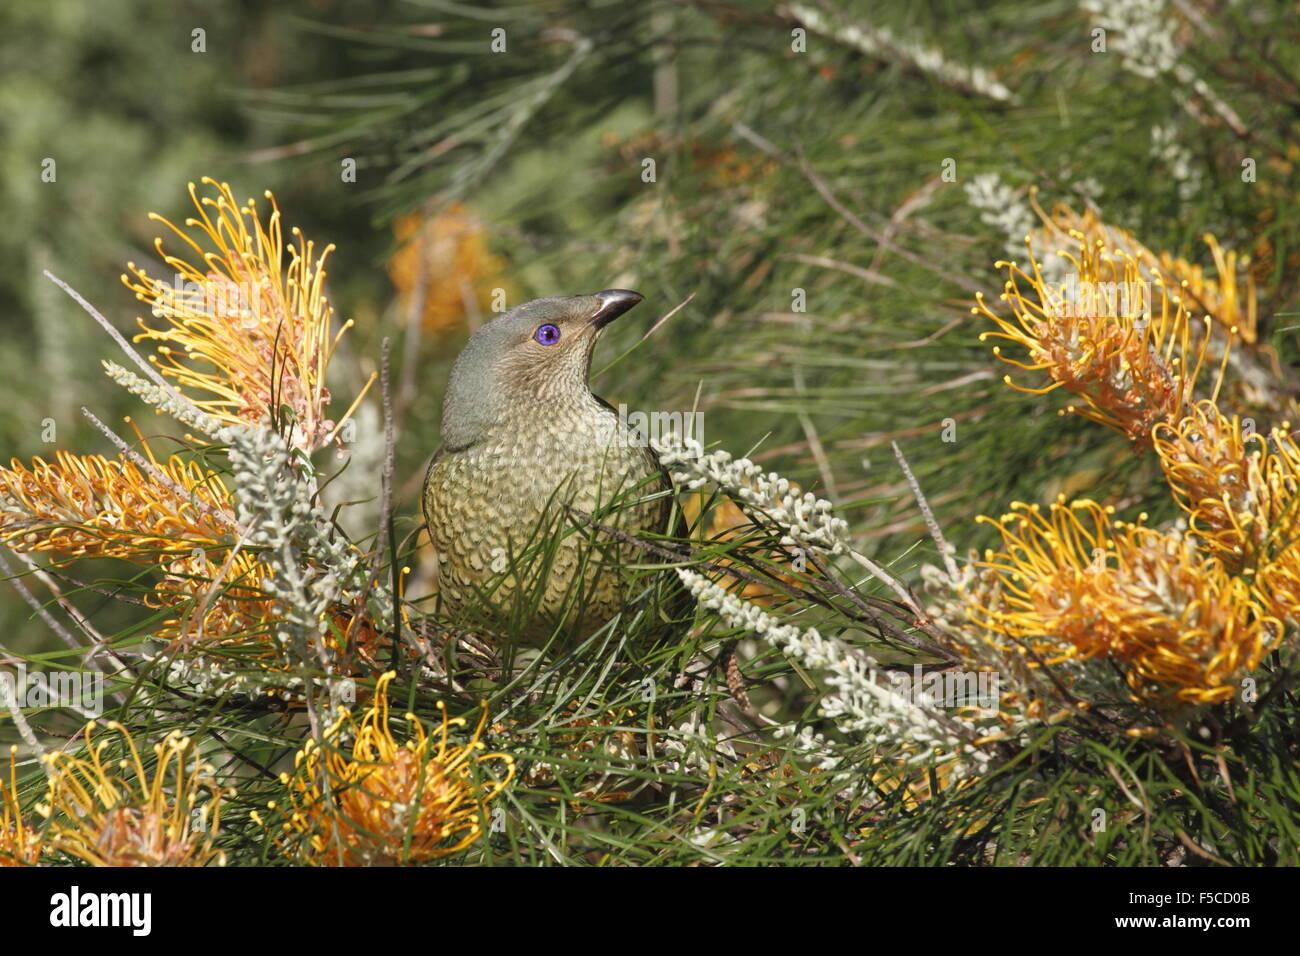 Satin bowerbird female in a banksia tree - Stock Image